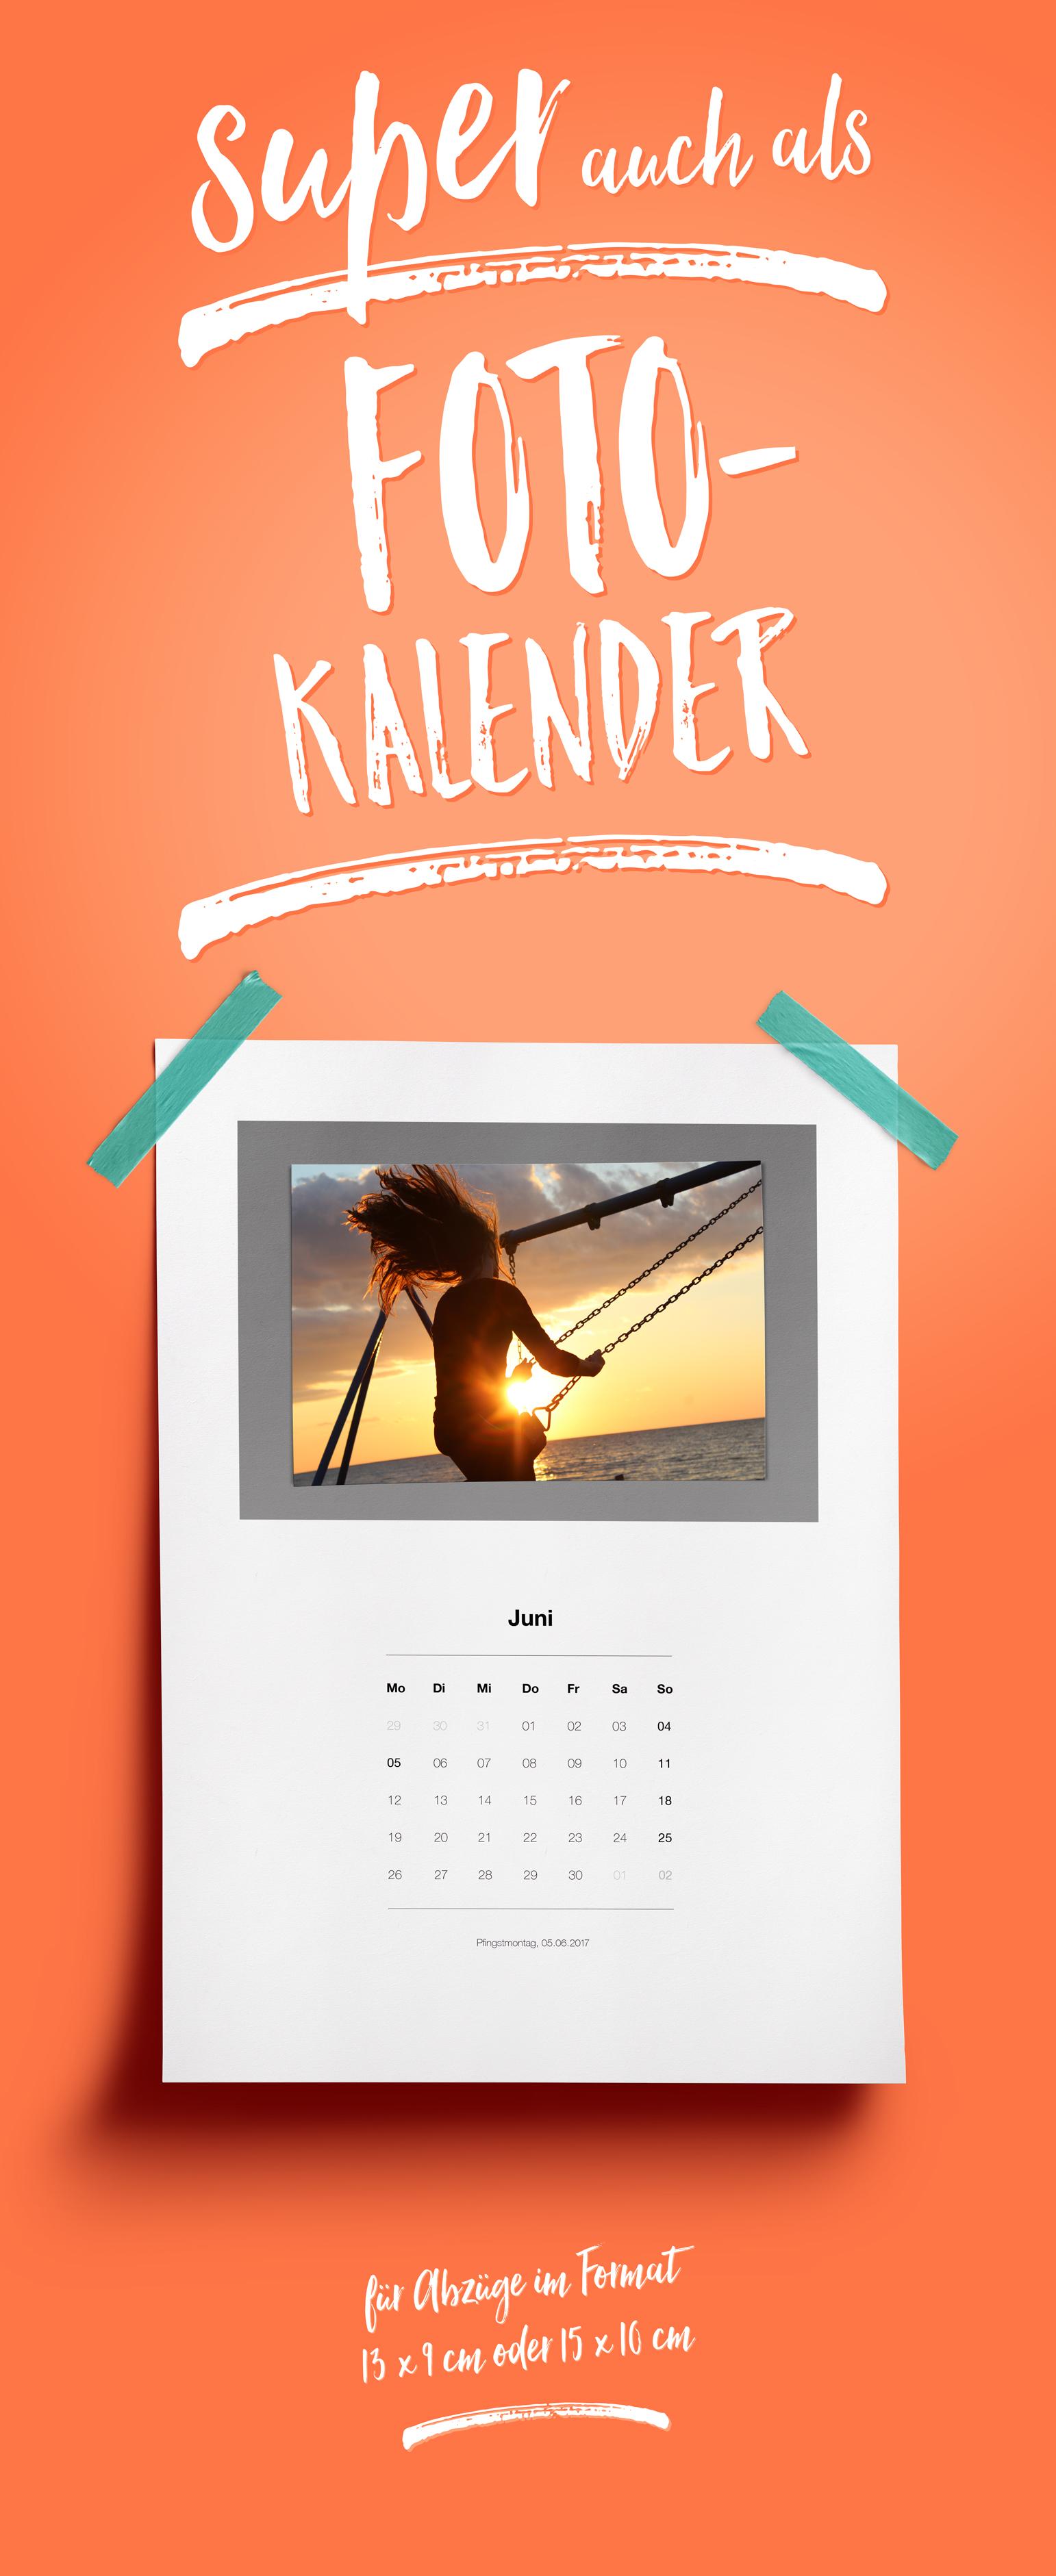 Kalender 2017 Gesa Siebert Kommunikationsdesign Fotokalender Free Download